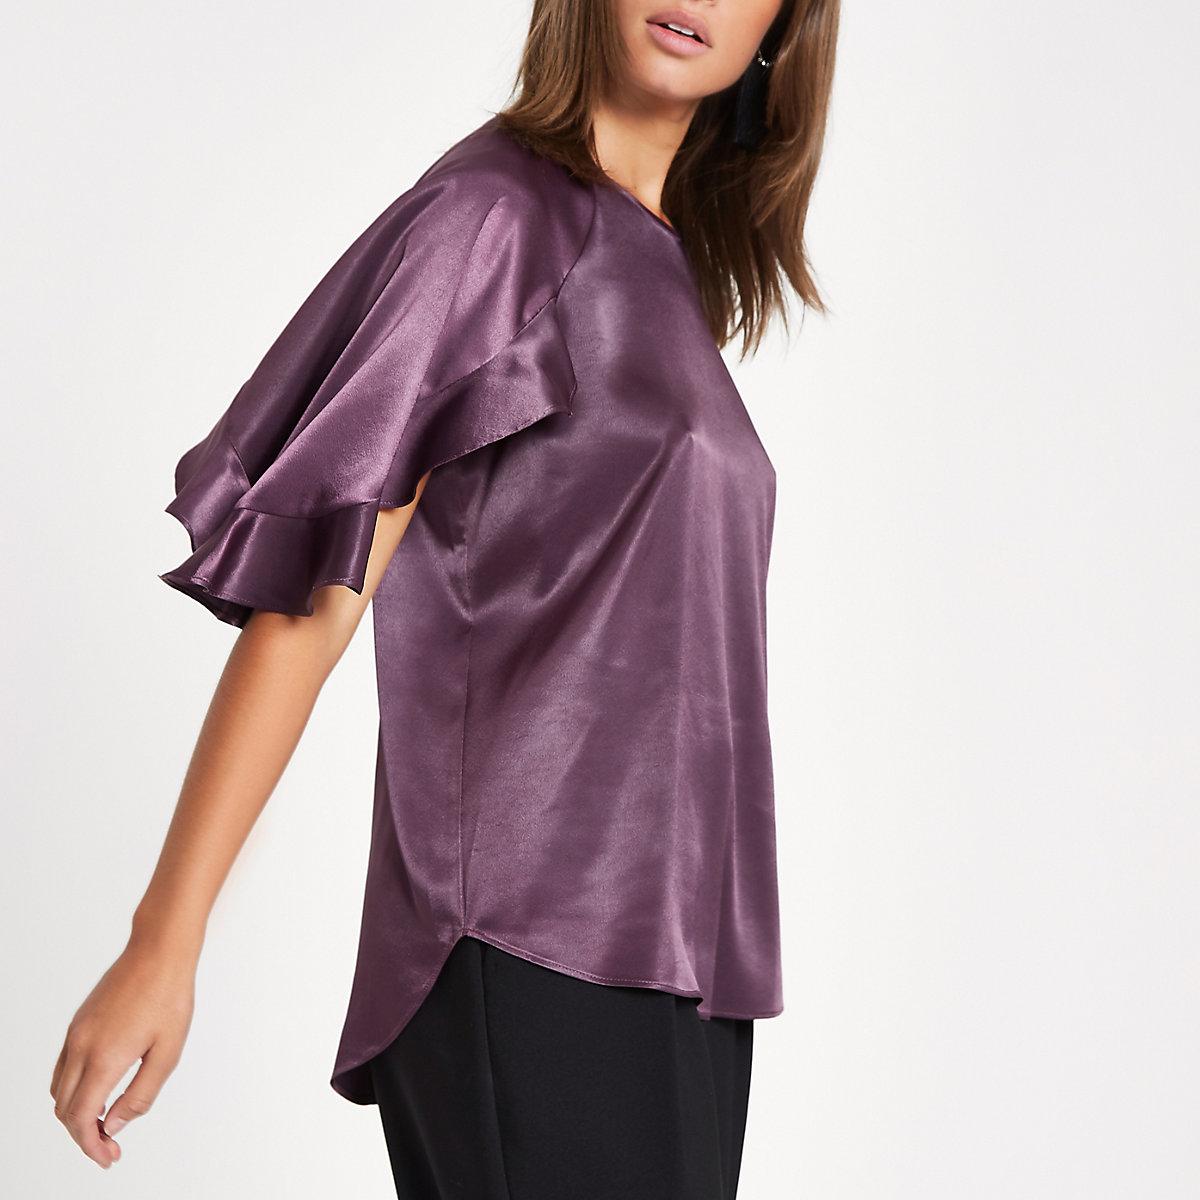 Purple chiffon frill sleeve top